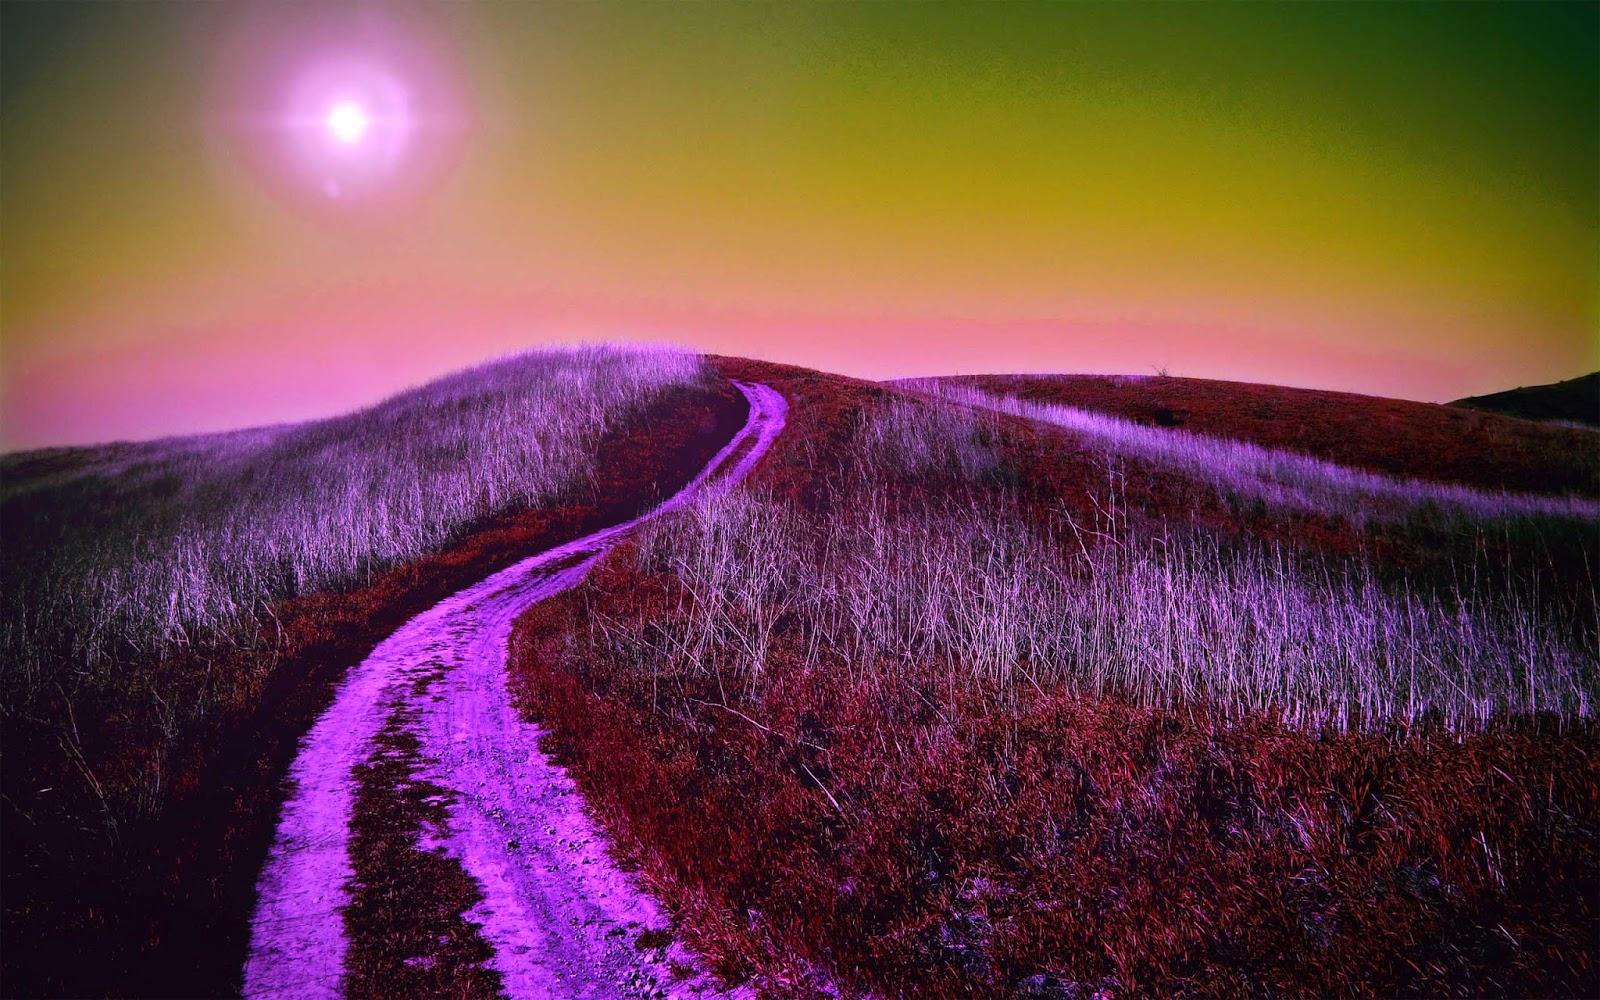 up_hill_road_natural_wallpaper